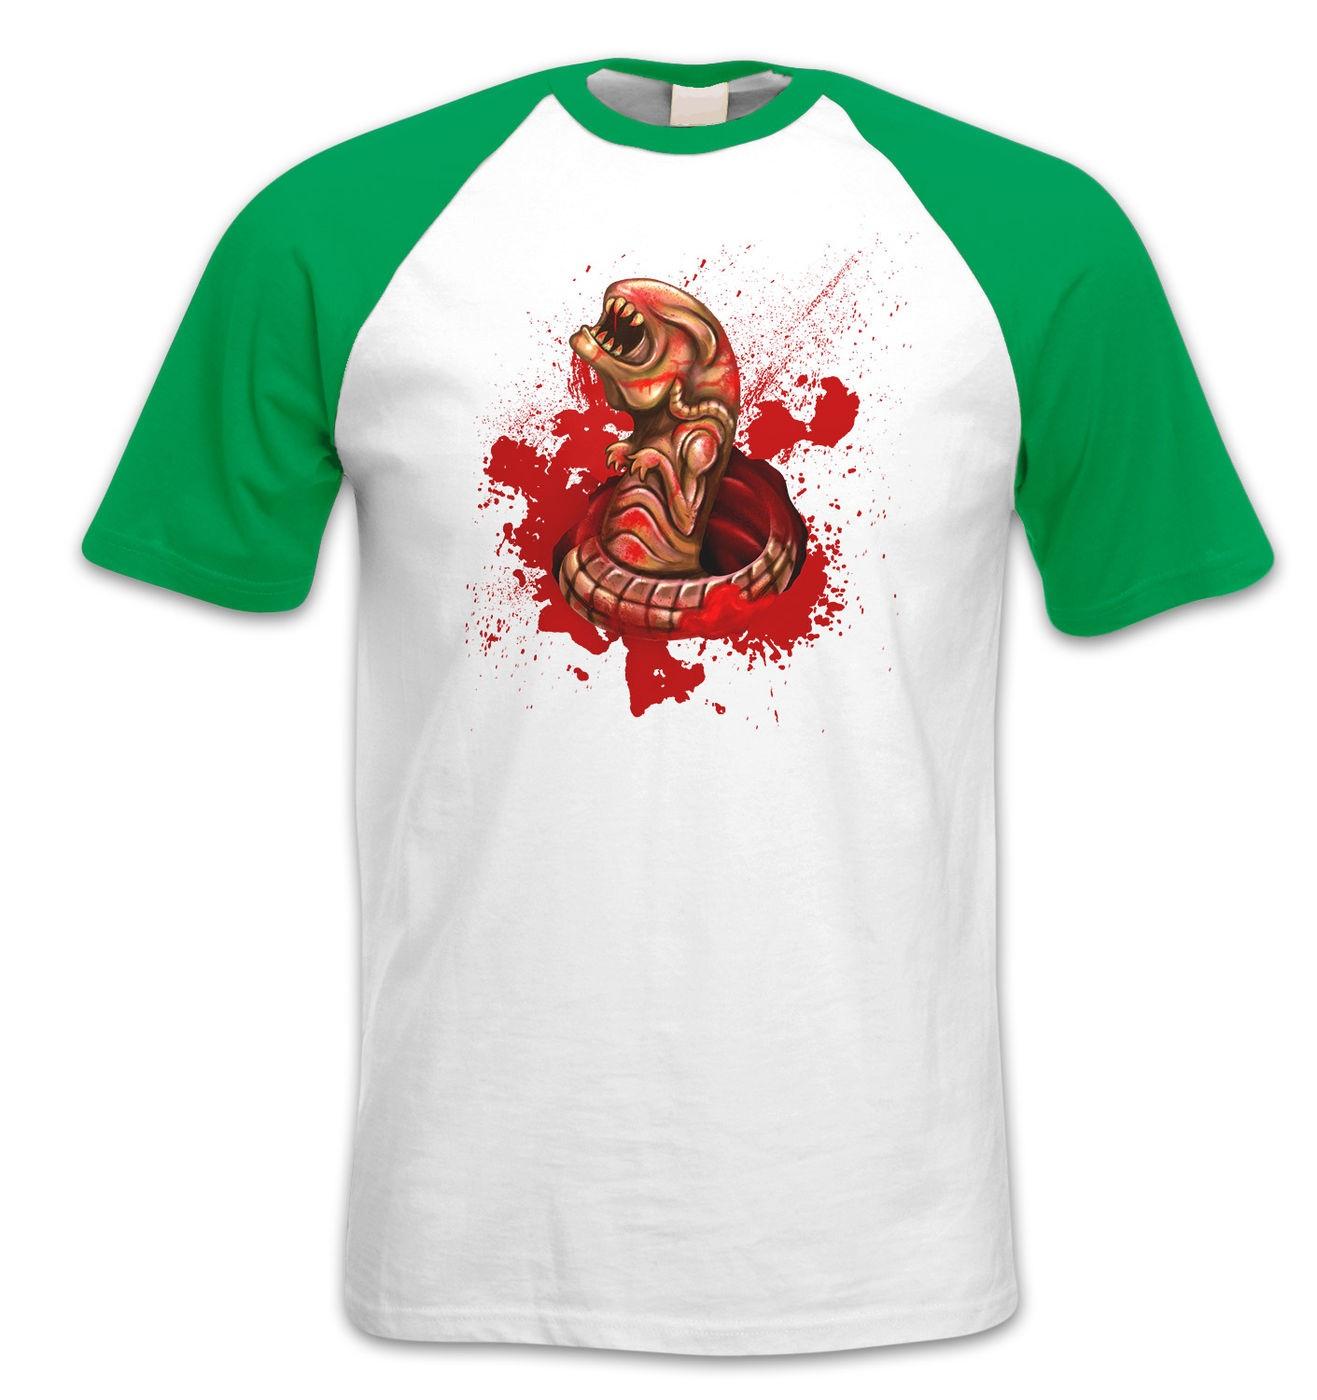 Chestburster Costume short sleeve baseball t-shirt by Something Geeky